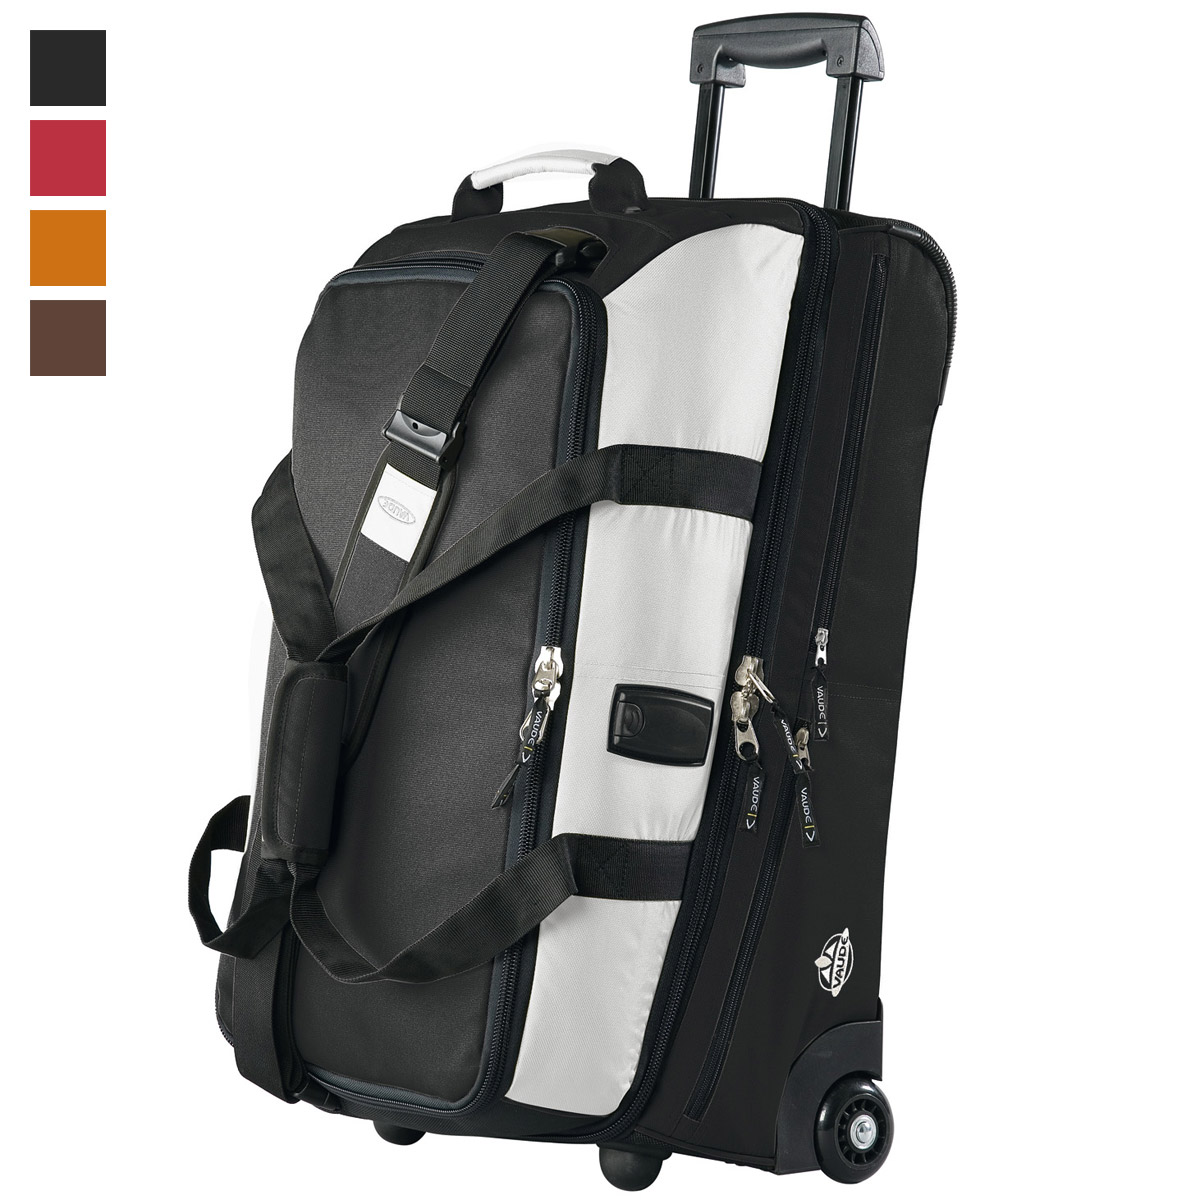 vaude tonga sport reise trolley tasche lkw plane neu ebay. Black Bedroom Furniture Sets. Home Design Ideas